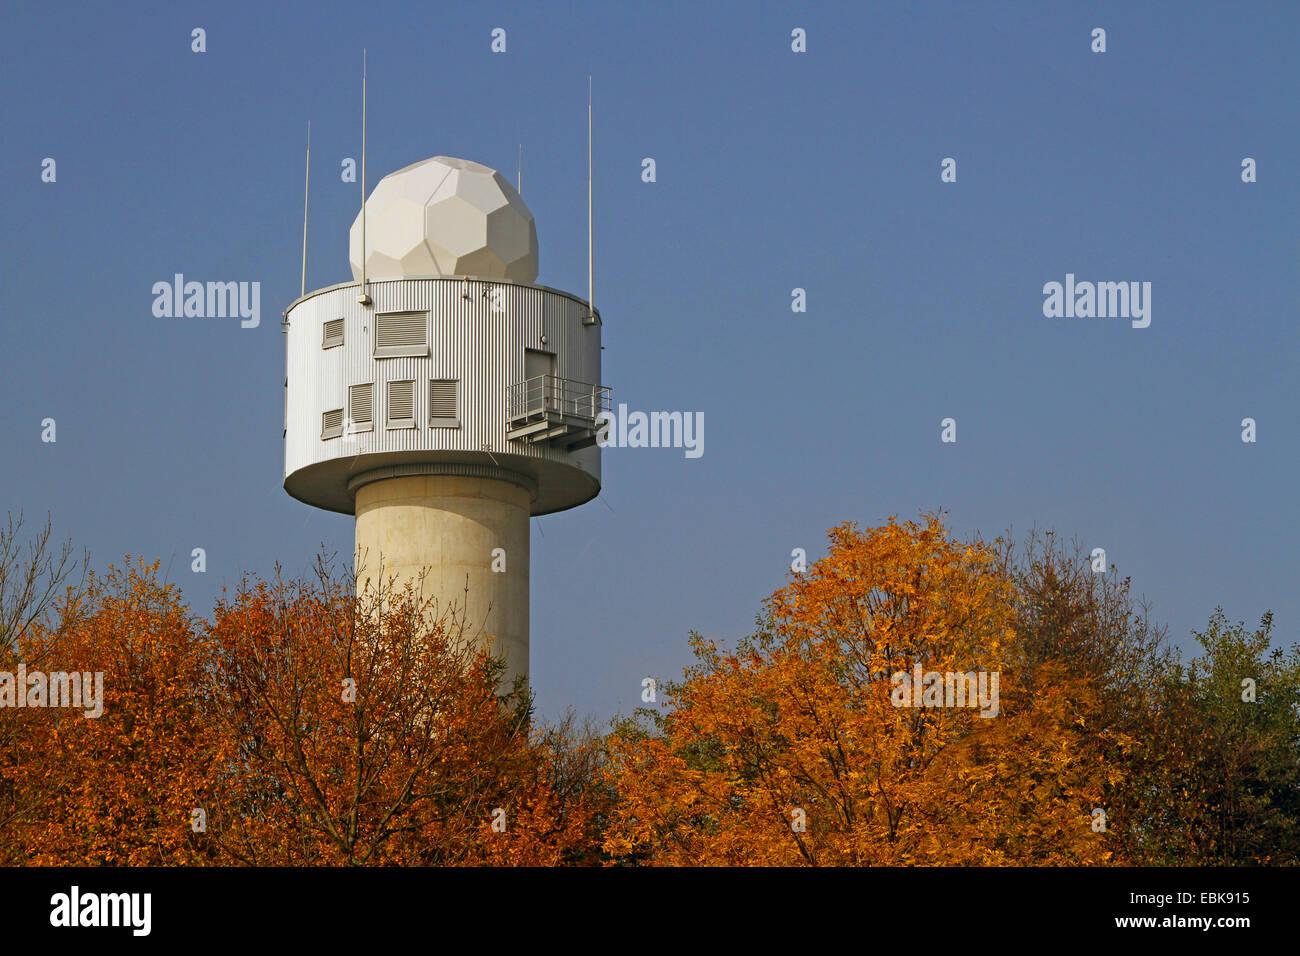 Weather Radar Station Stockfotos & Weather Radar Station ...